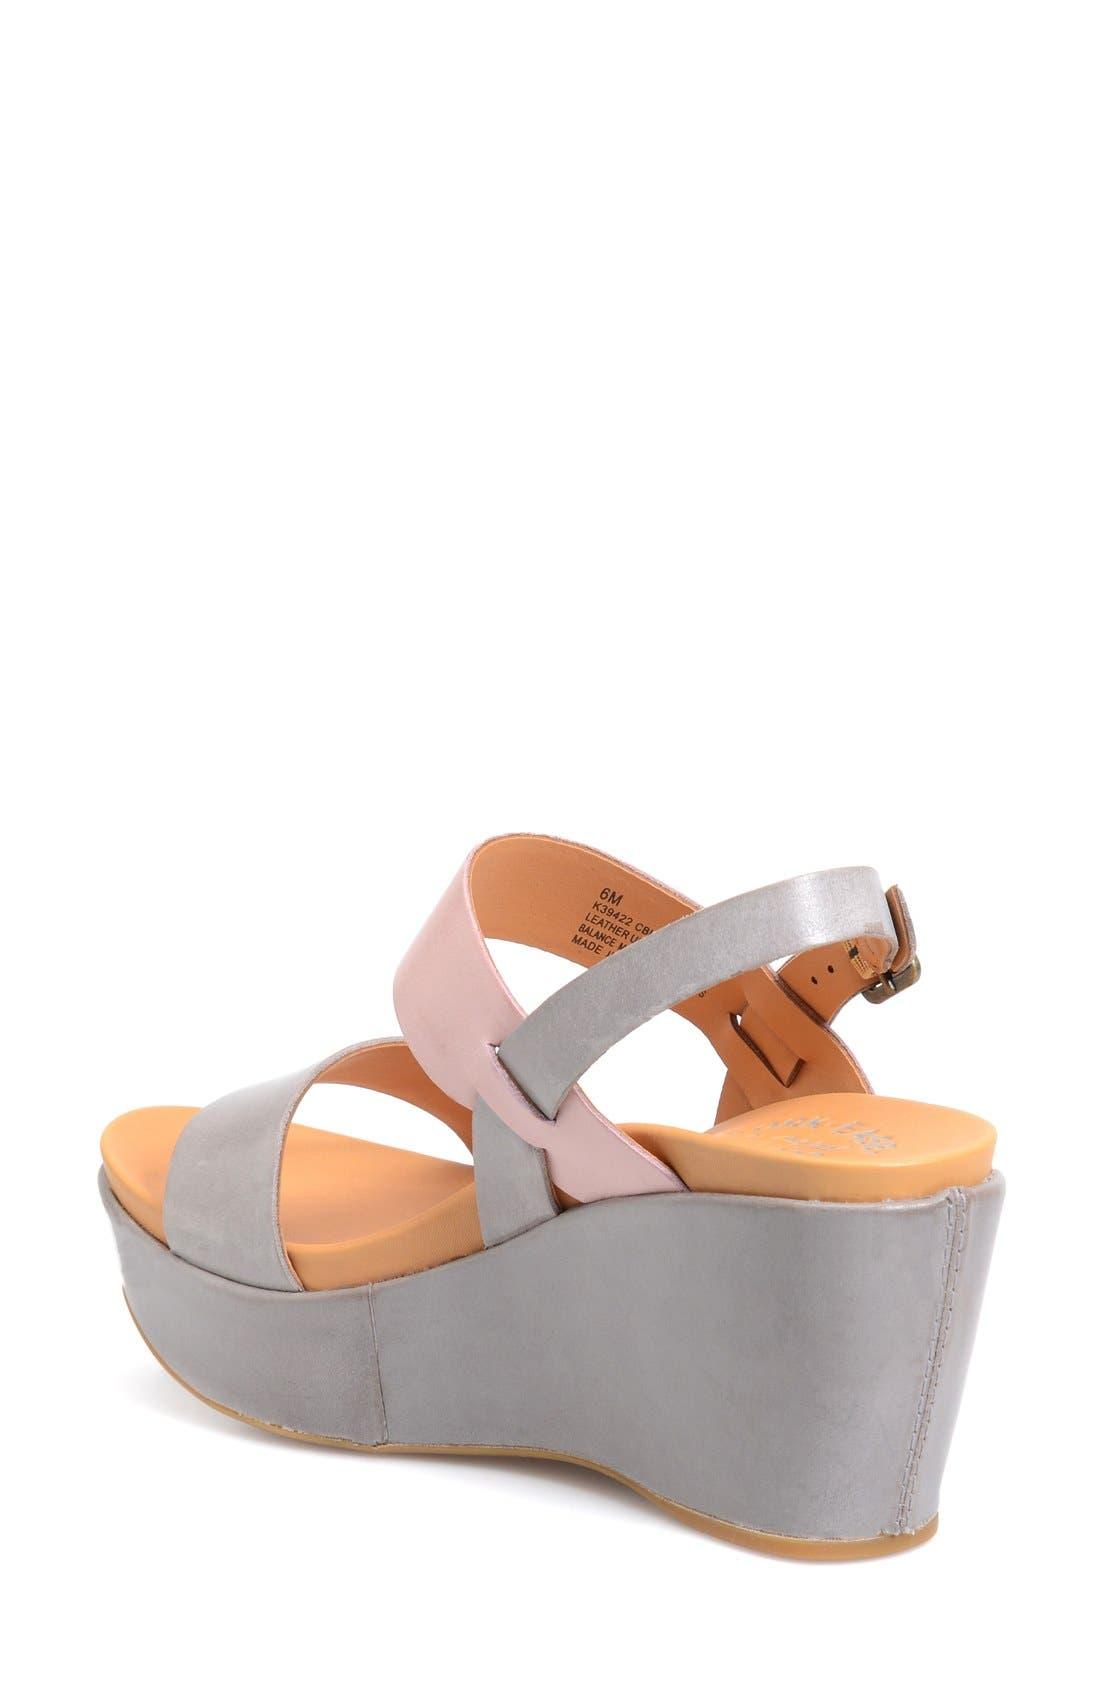 'Austin' Slingback Wedge Sandal,                             Alternate thumbnail 14, color,